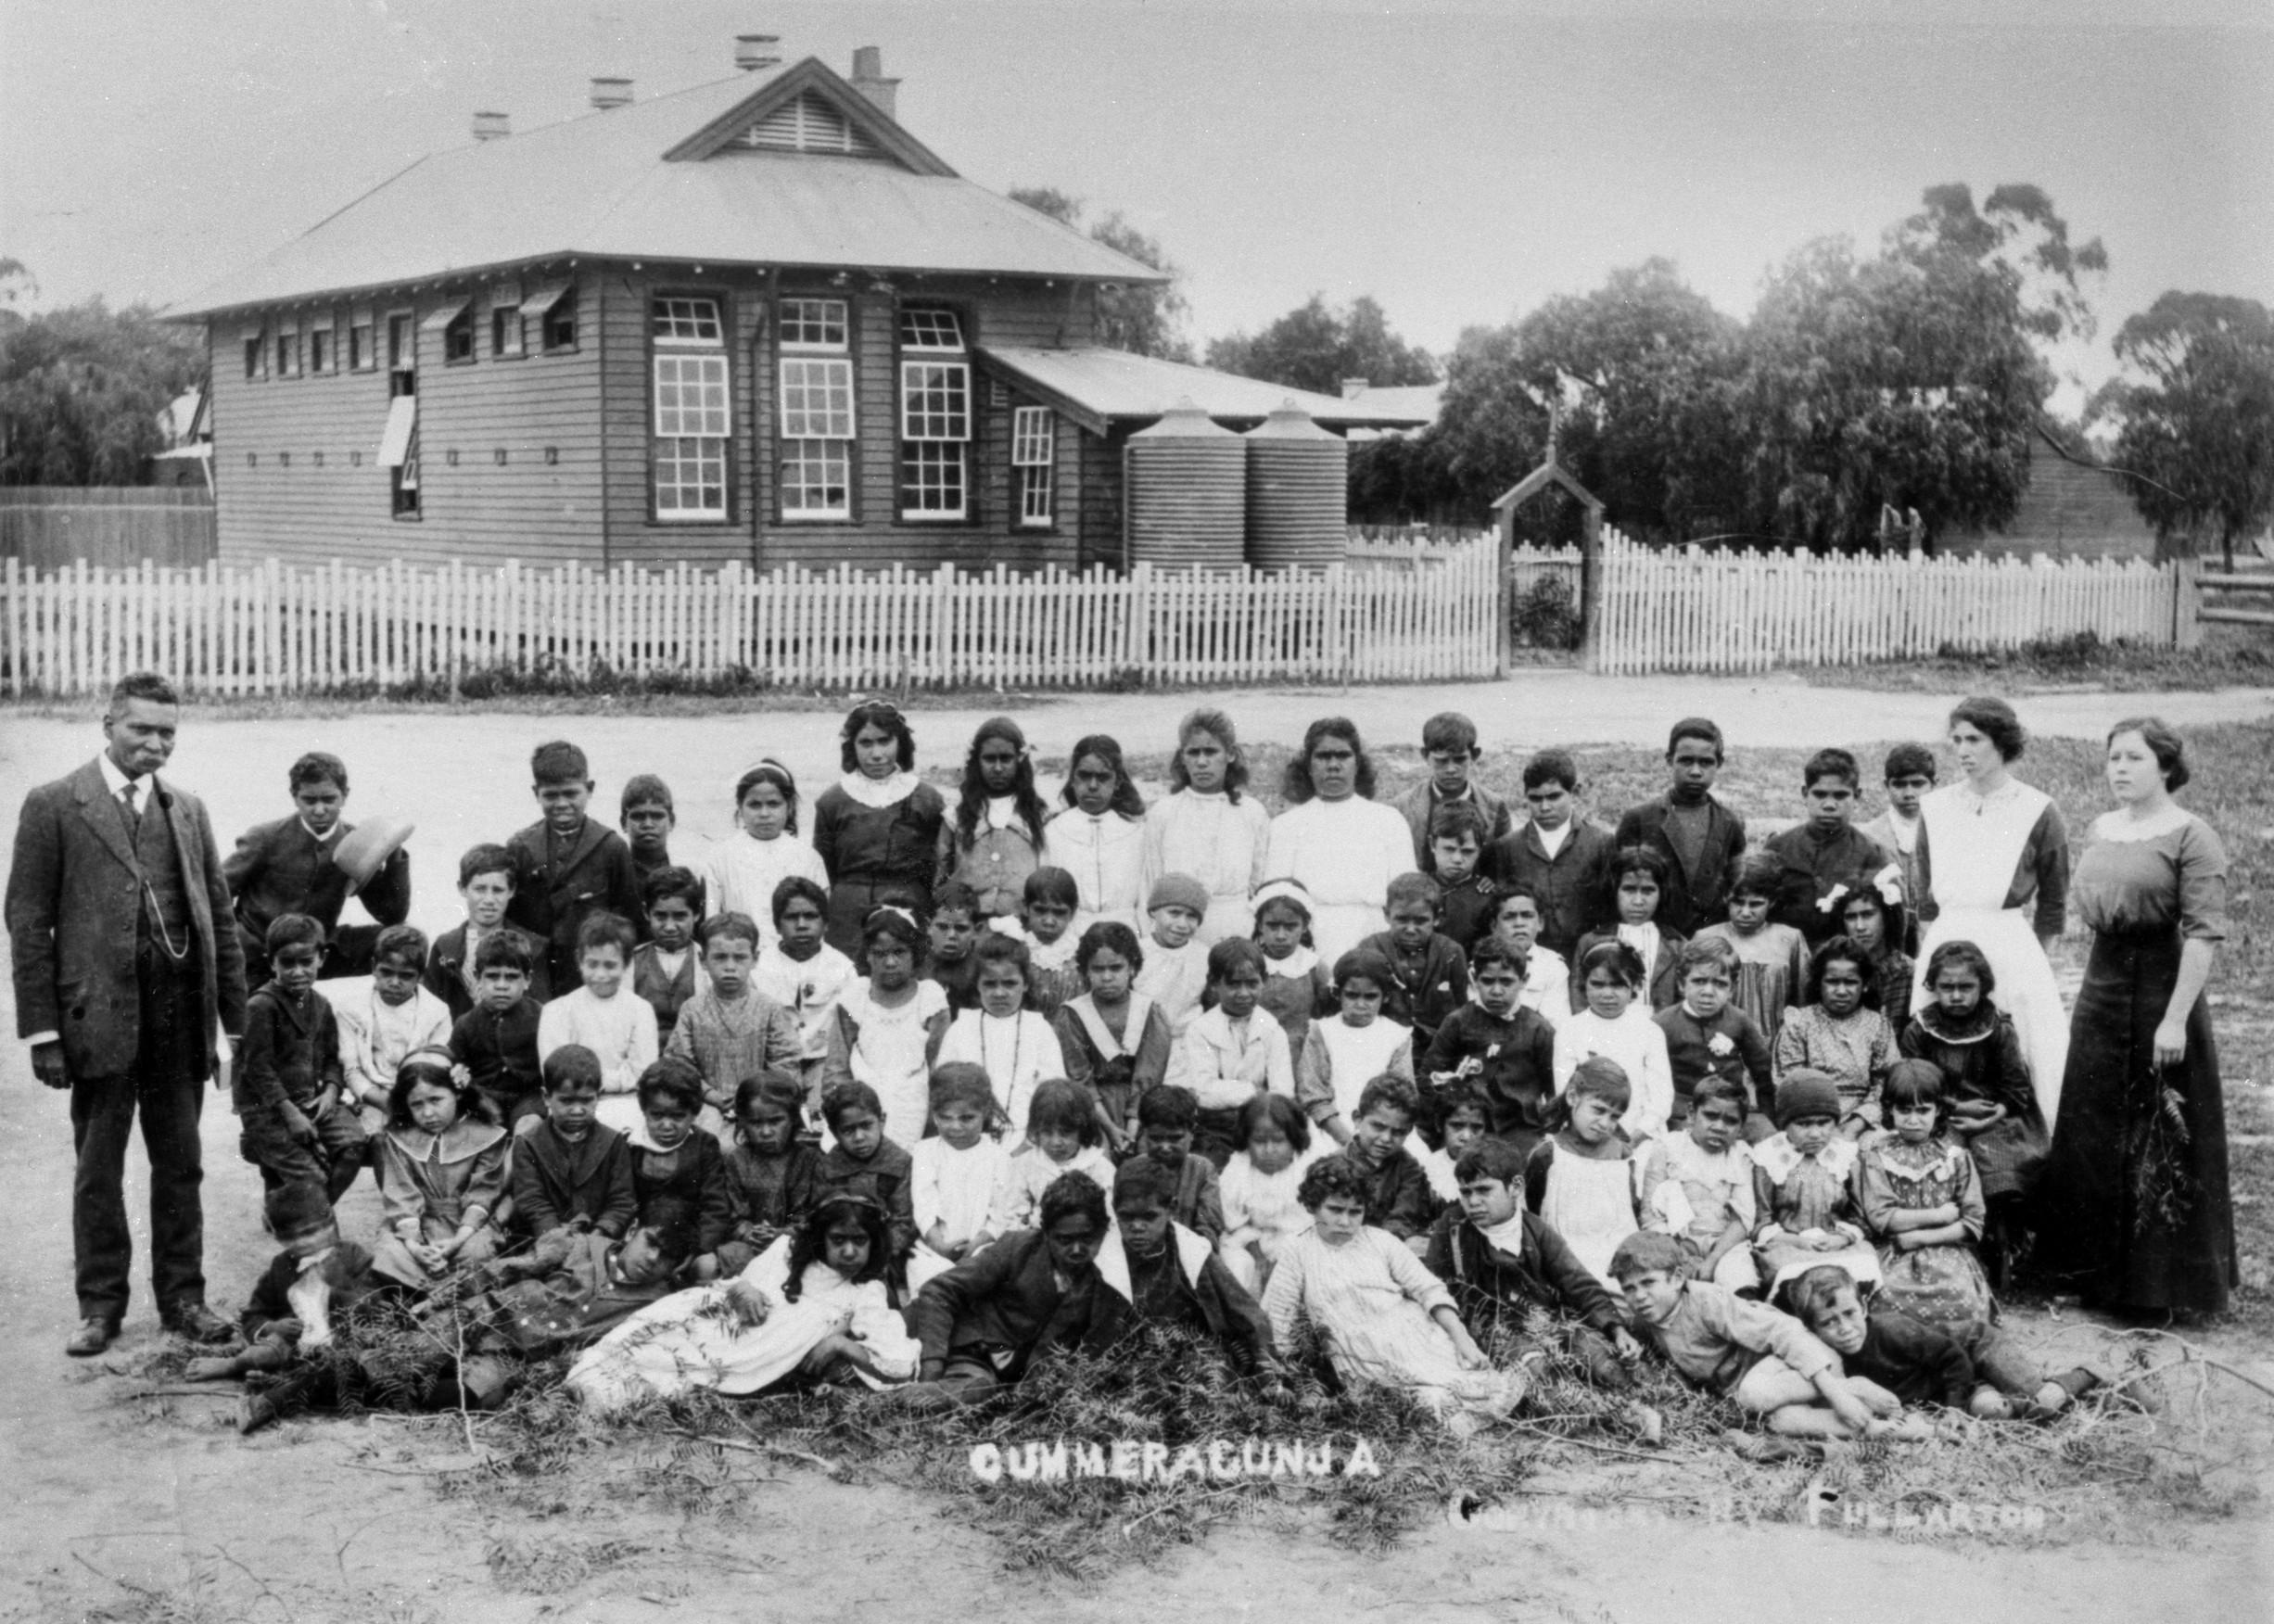 Cummergunja school